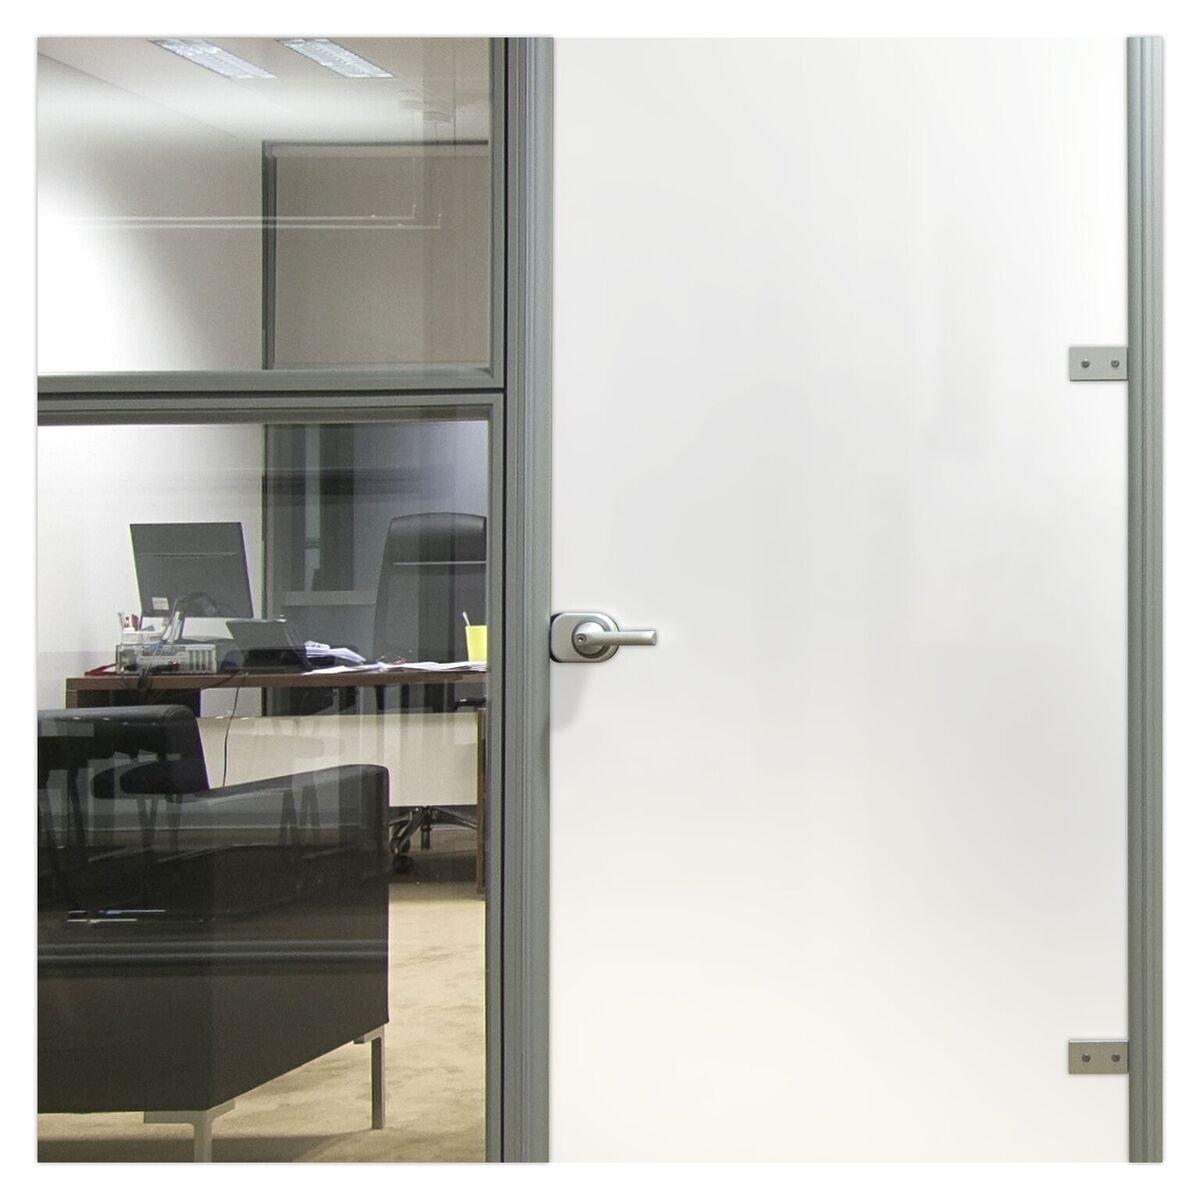 BDF WHTT Window Film Whiteout Privacy (36in X 25ft)